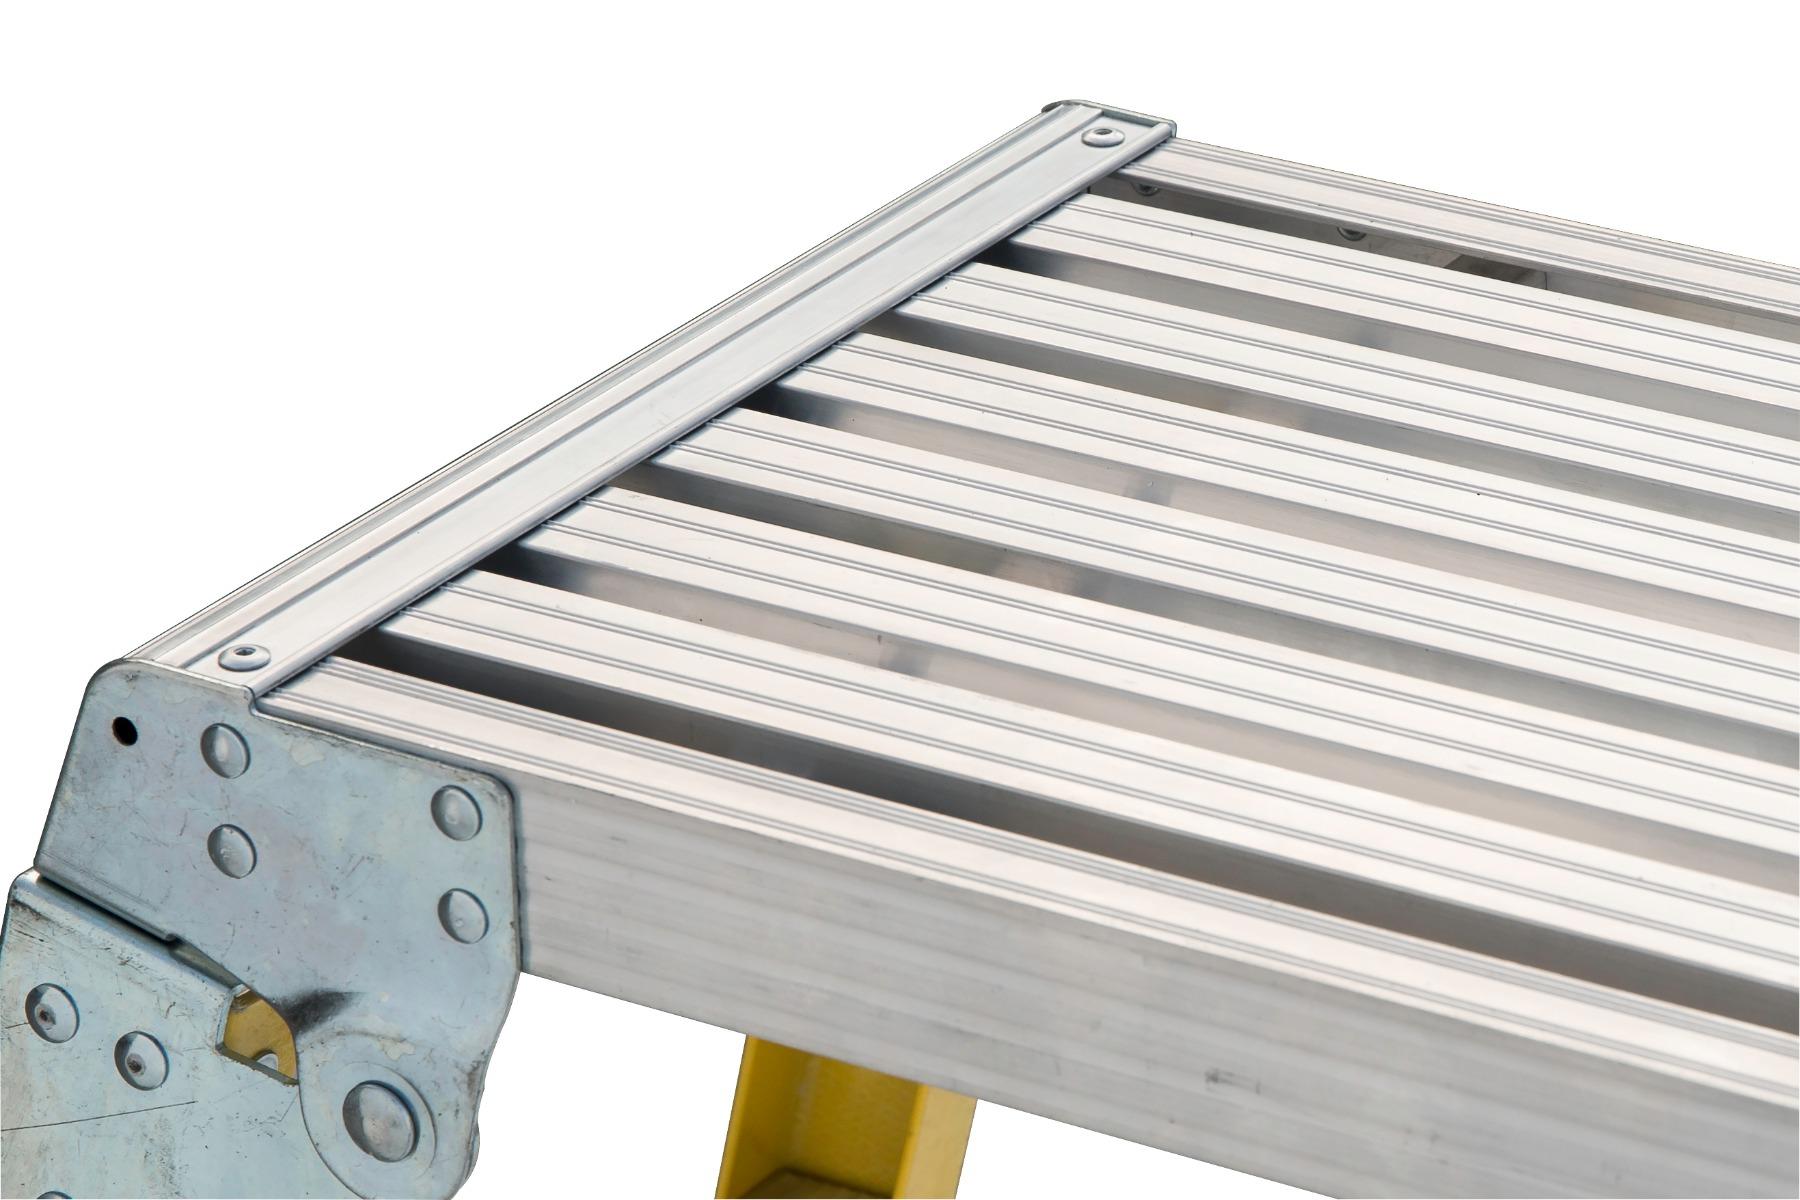 Louisville 3' Fiberglass Mini Working Platform